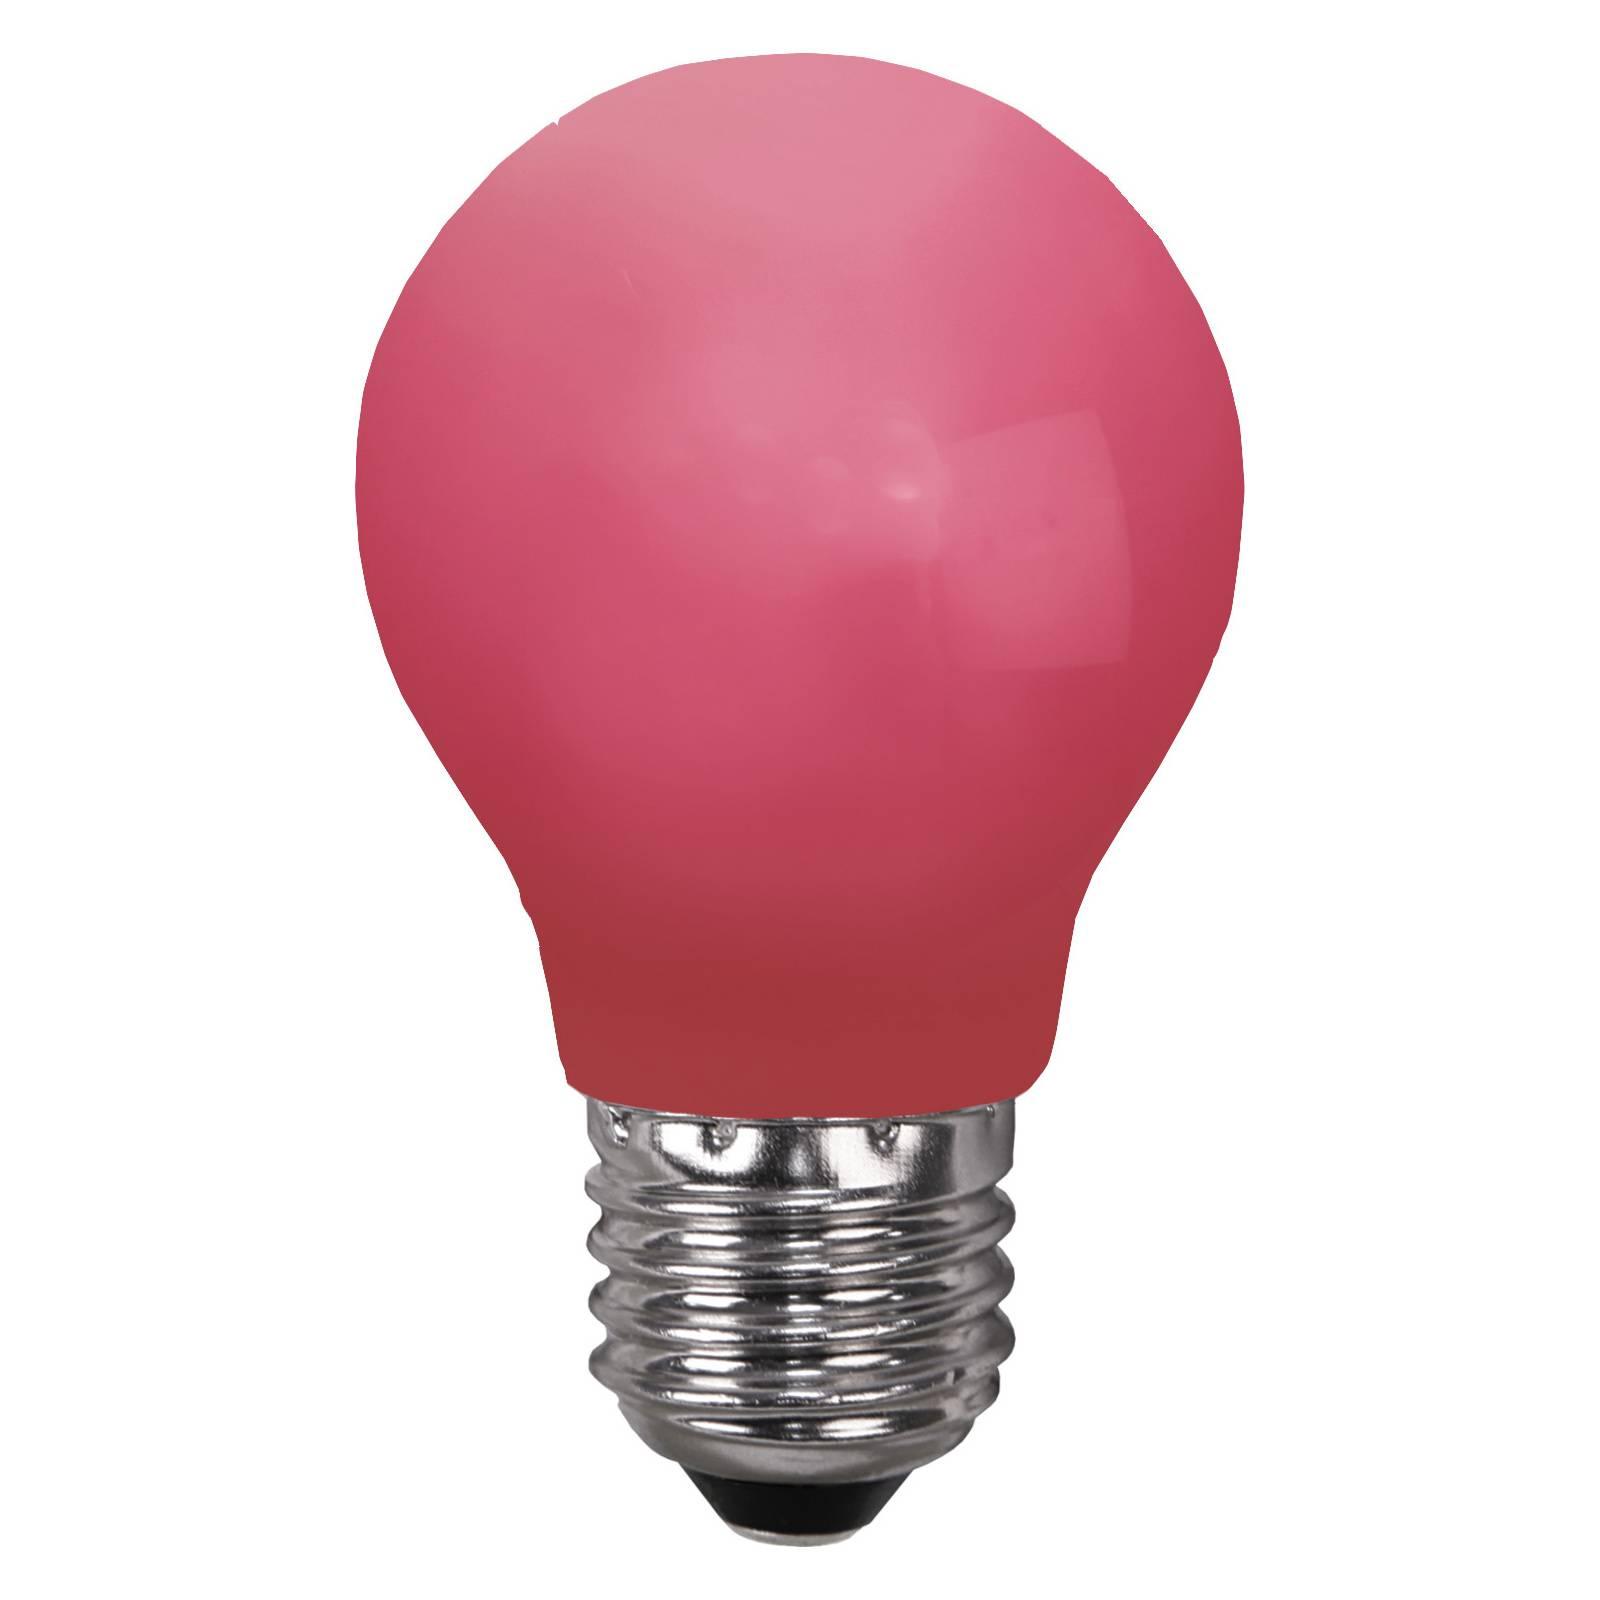 LED-lamppu E27 valoketjuihin, murtumaton, punainen